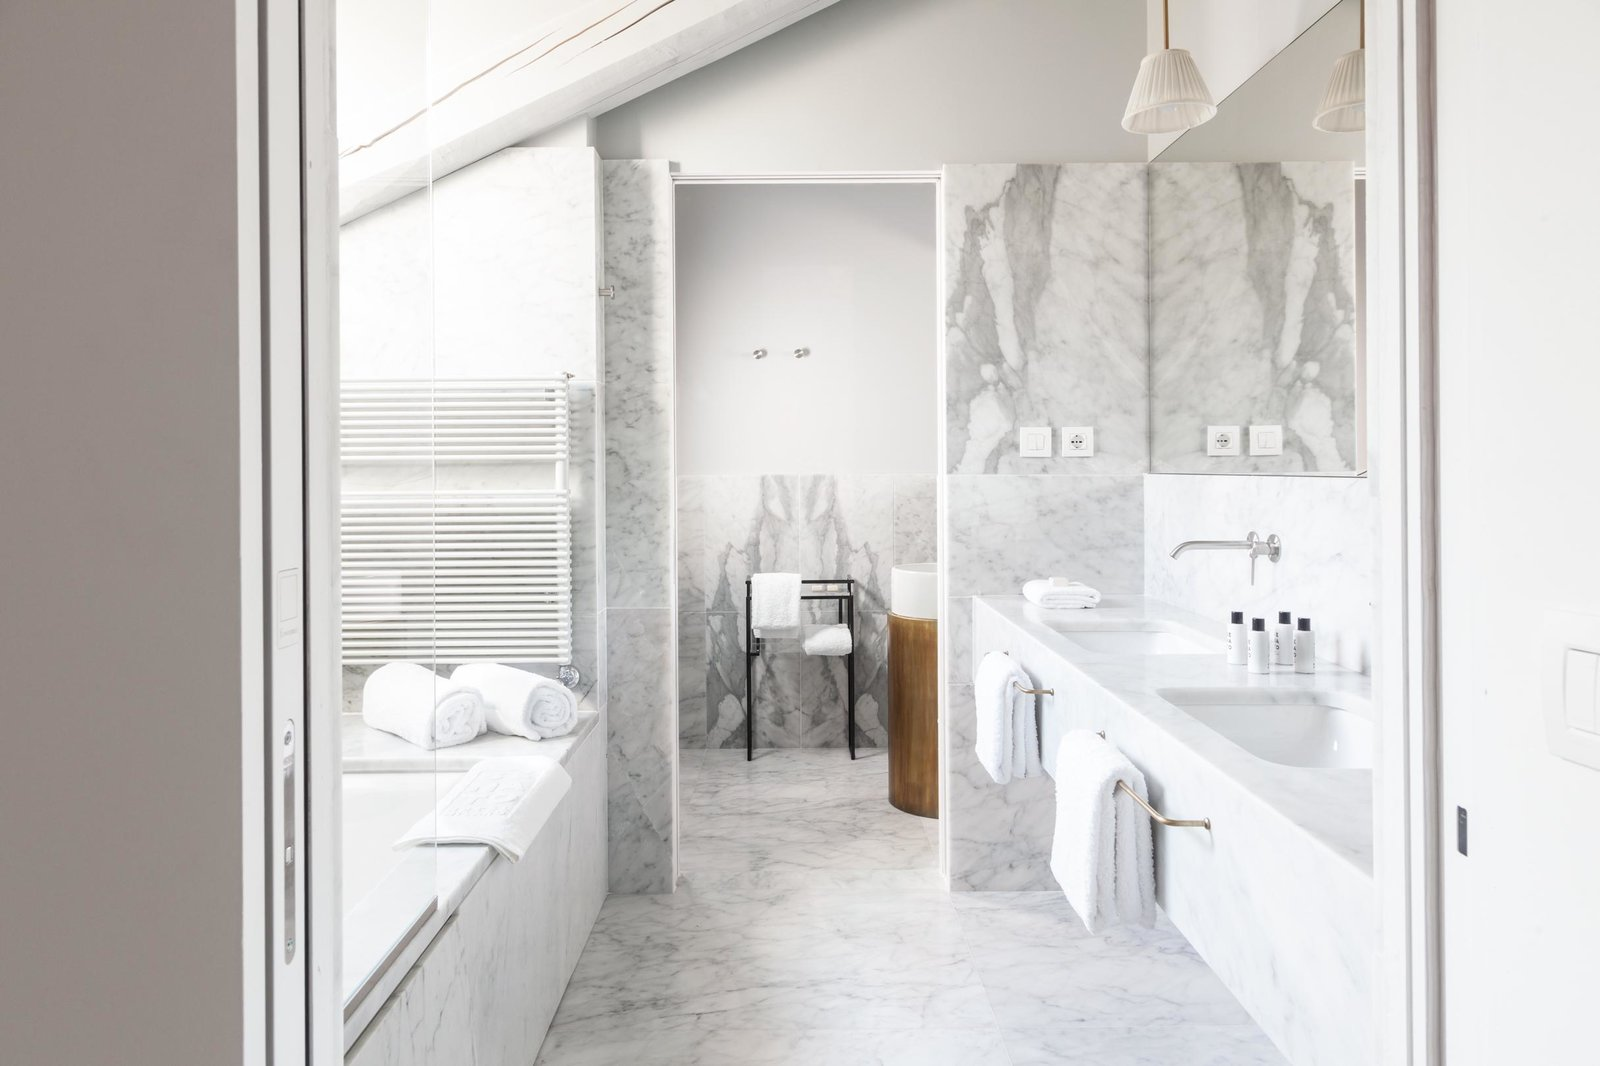 Bath Room, Undermount Tub, Marble Counter, Pendant Lighting, Undermount Sink, and Marble Wall  Senato Hotel Milano